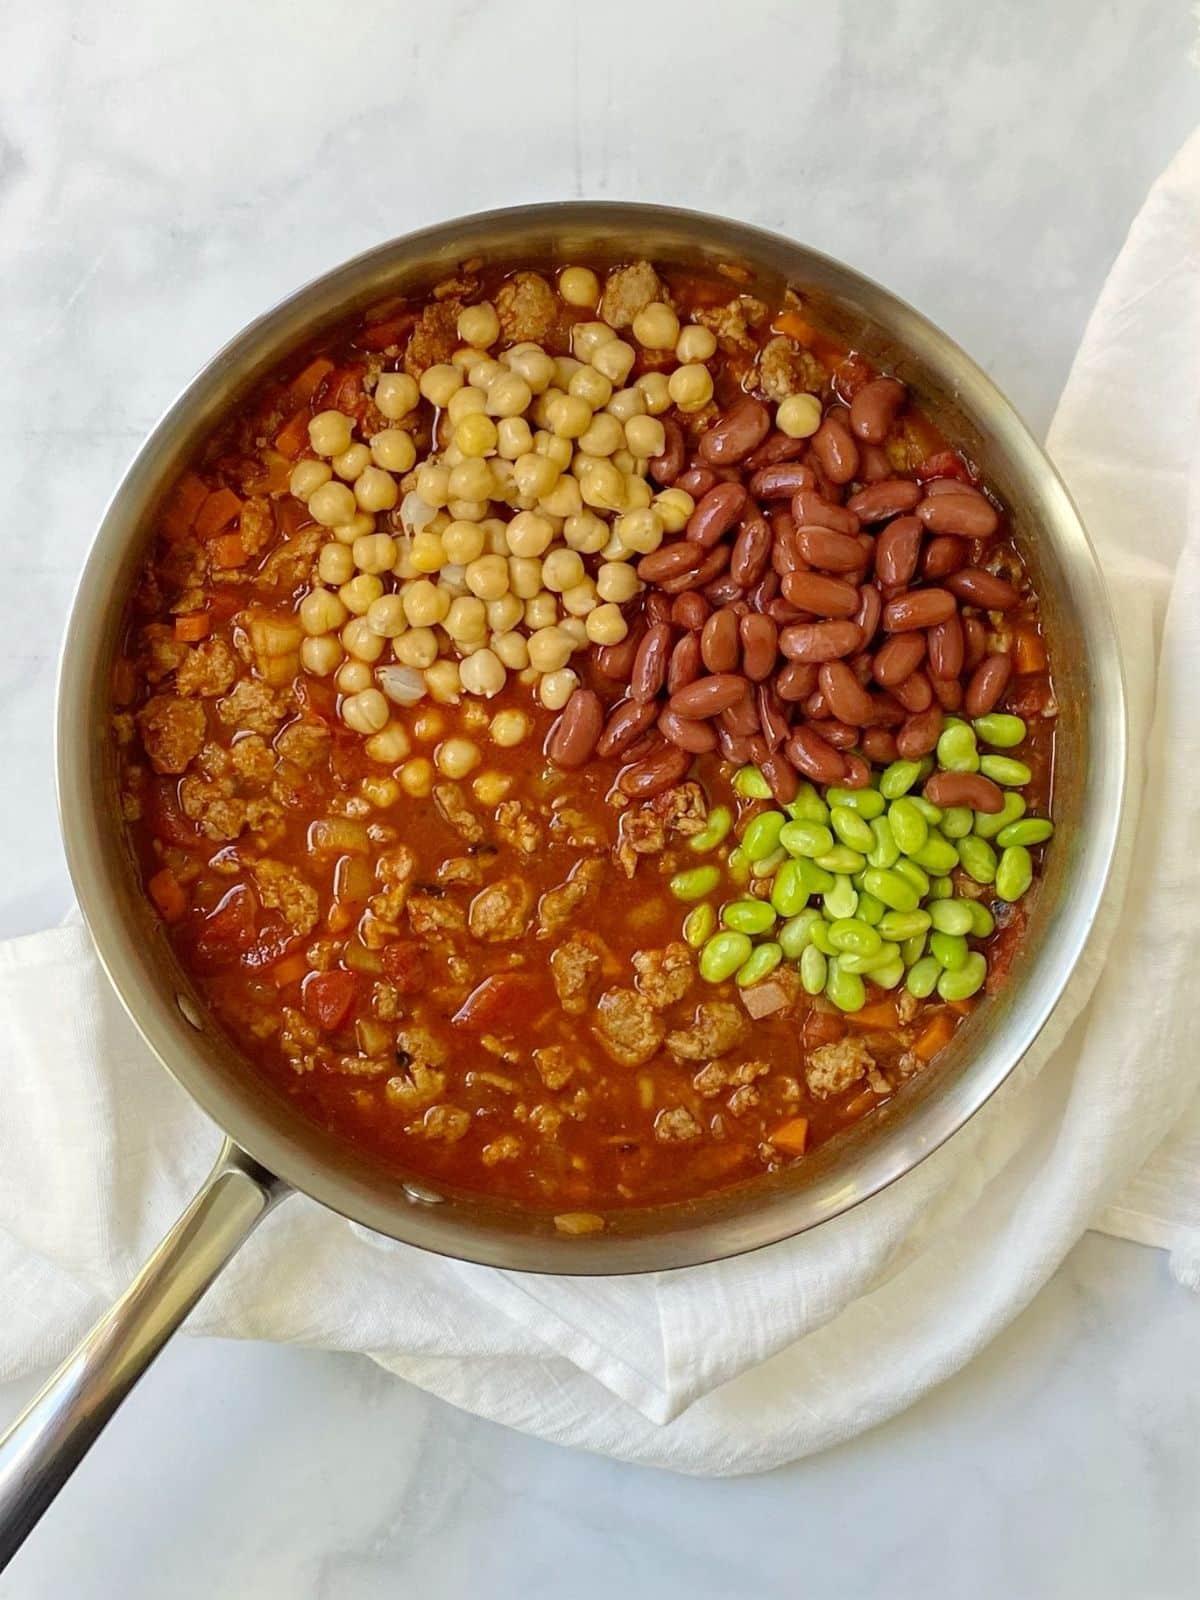 adding beans to turkey chili.